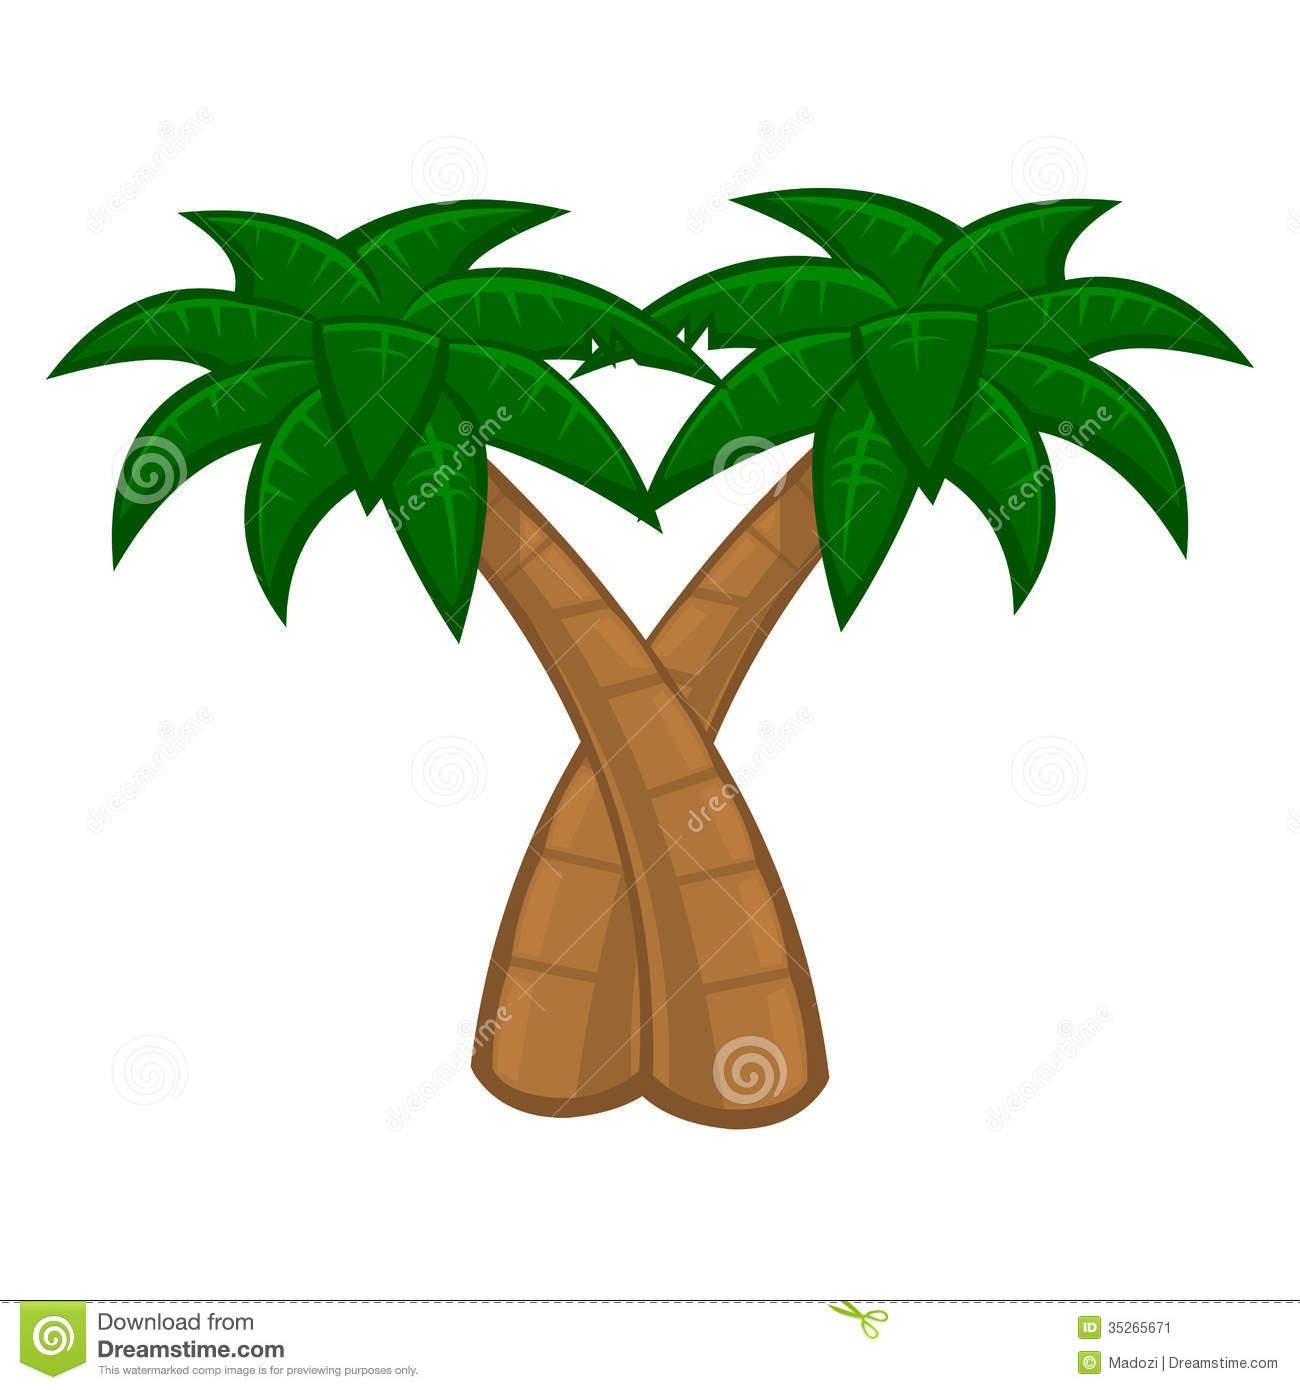 Trunk clipart coconut tree #3